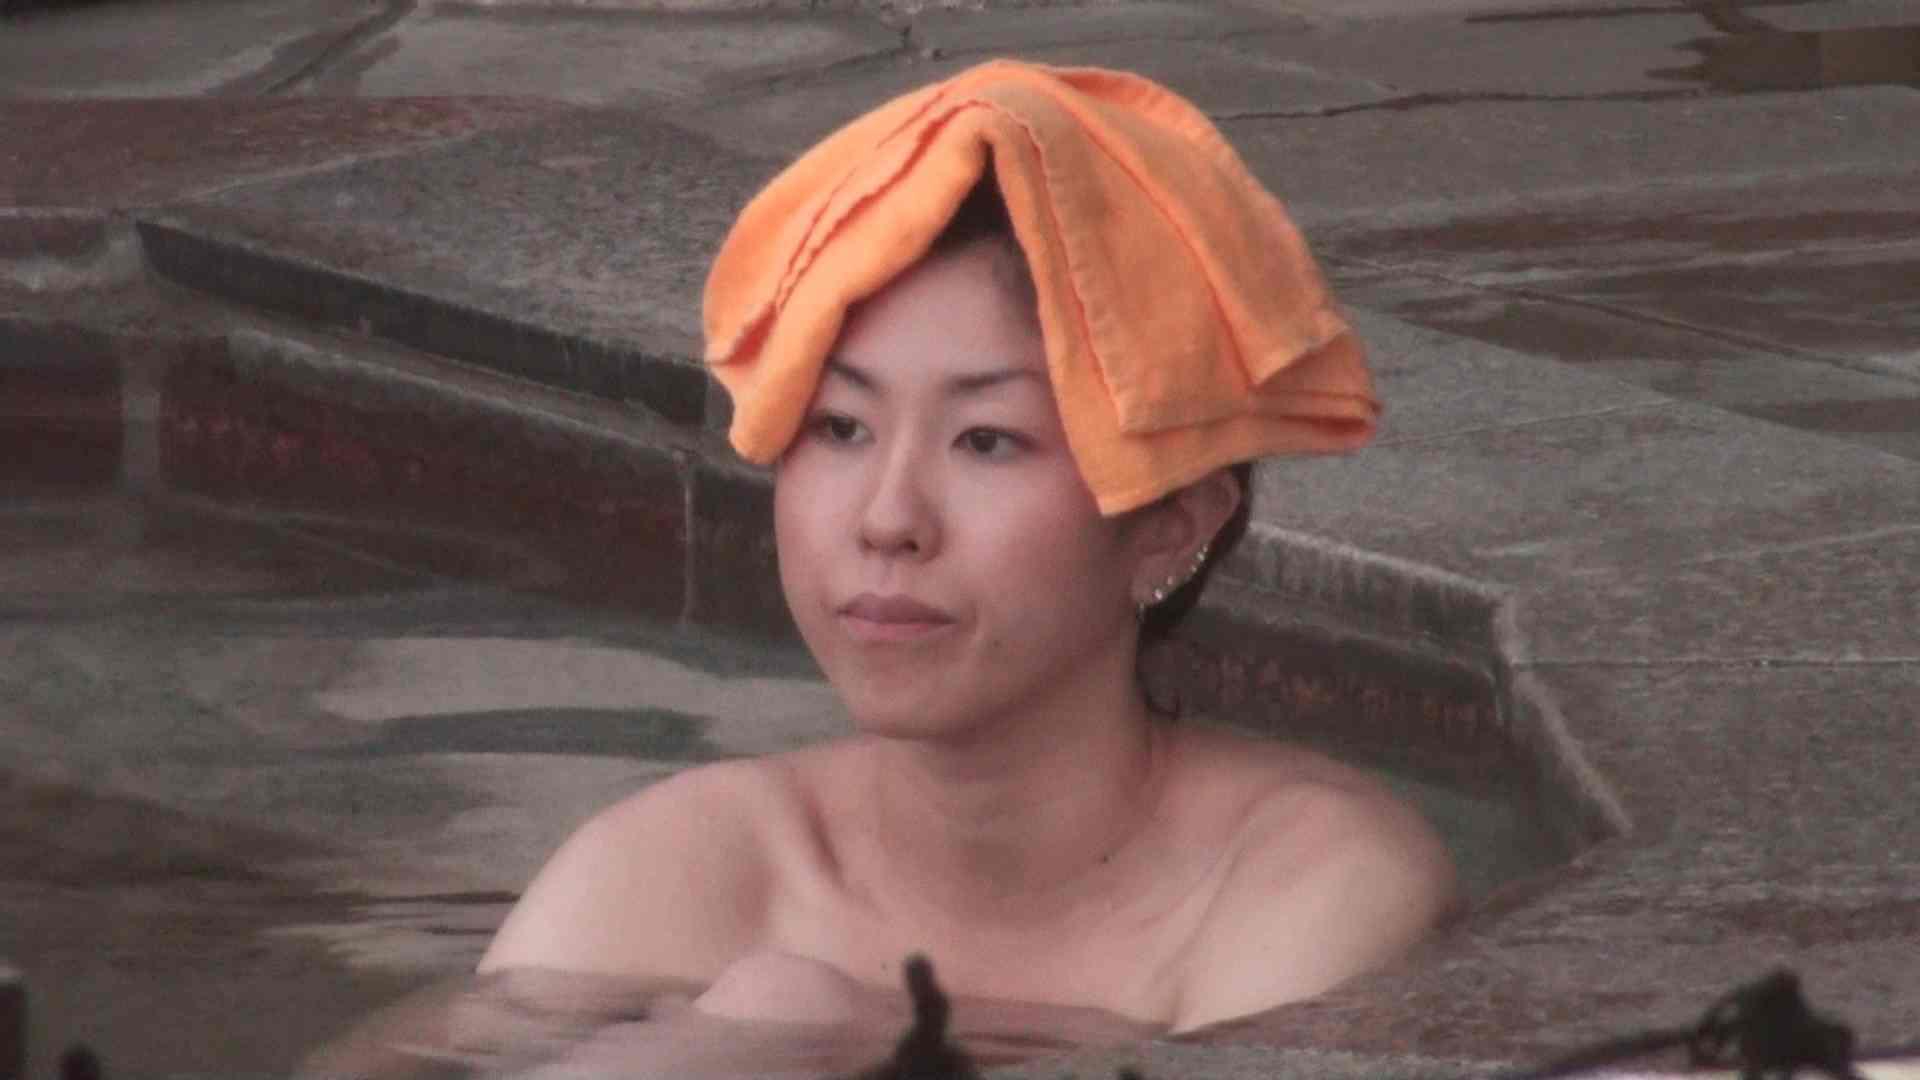 Aquaな露天風呂Vol.135 盗撮師作品  105pic 93